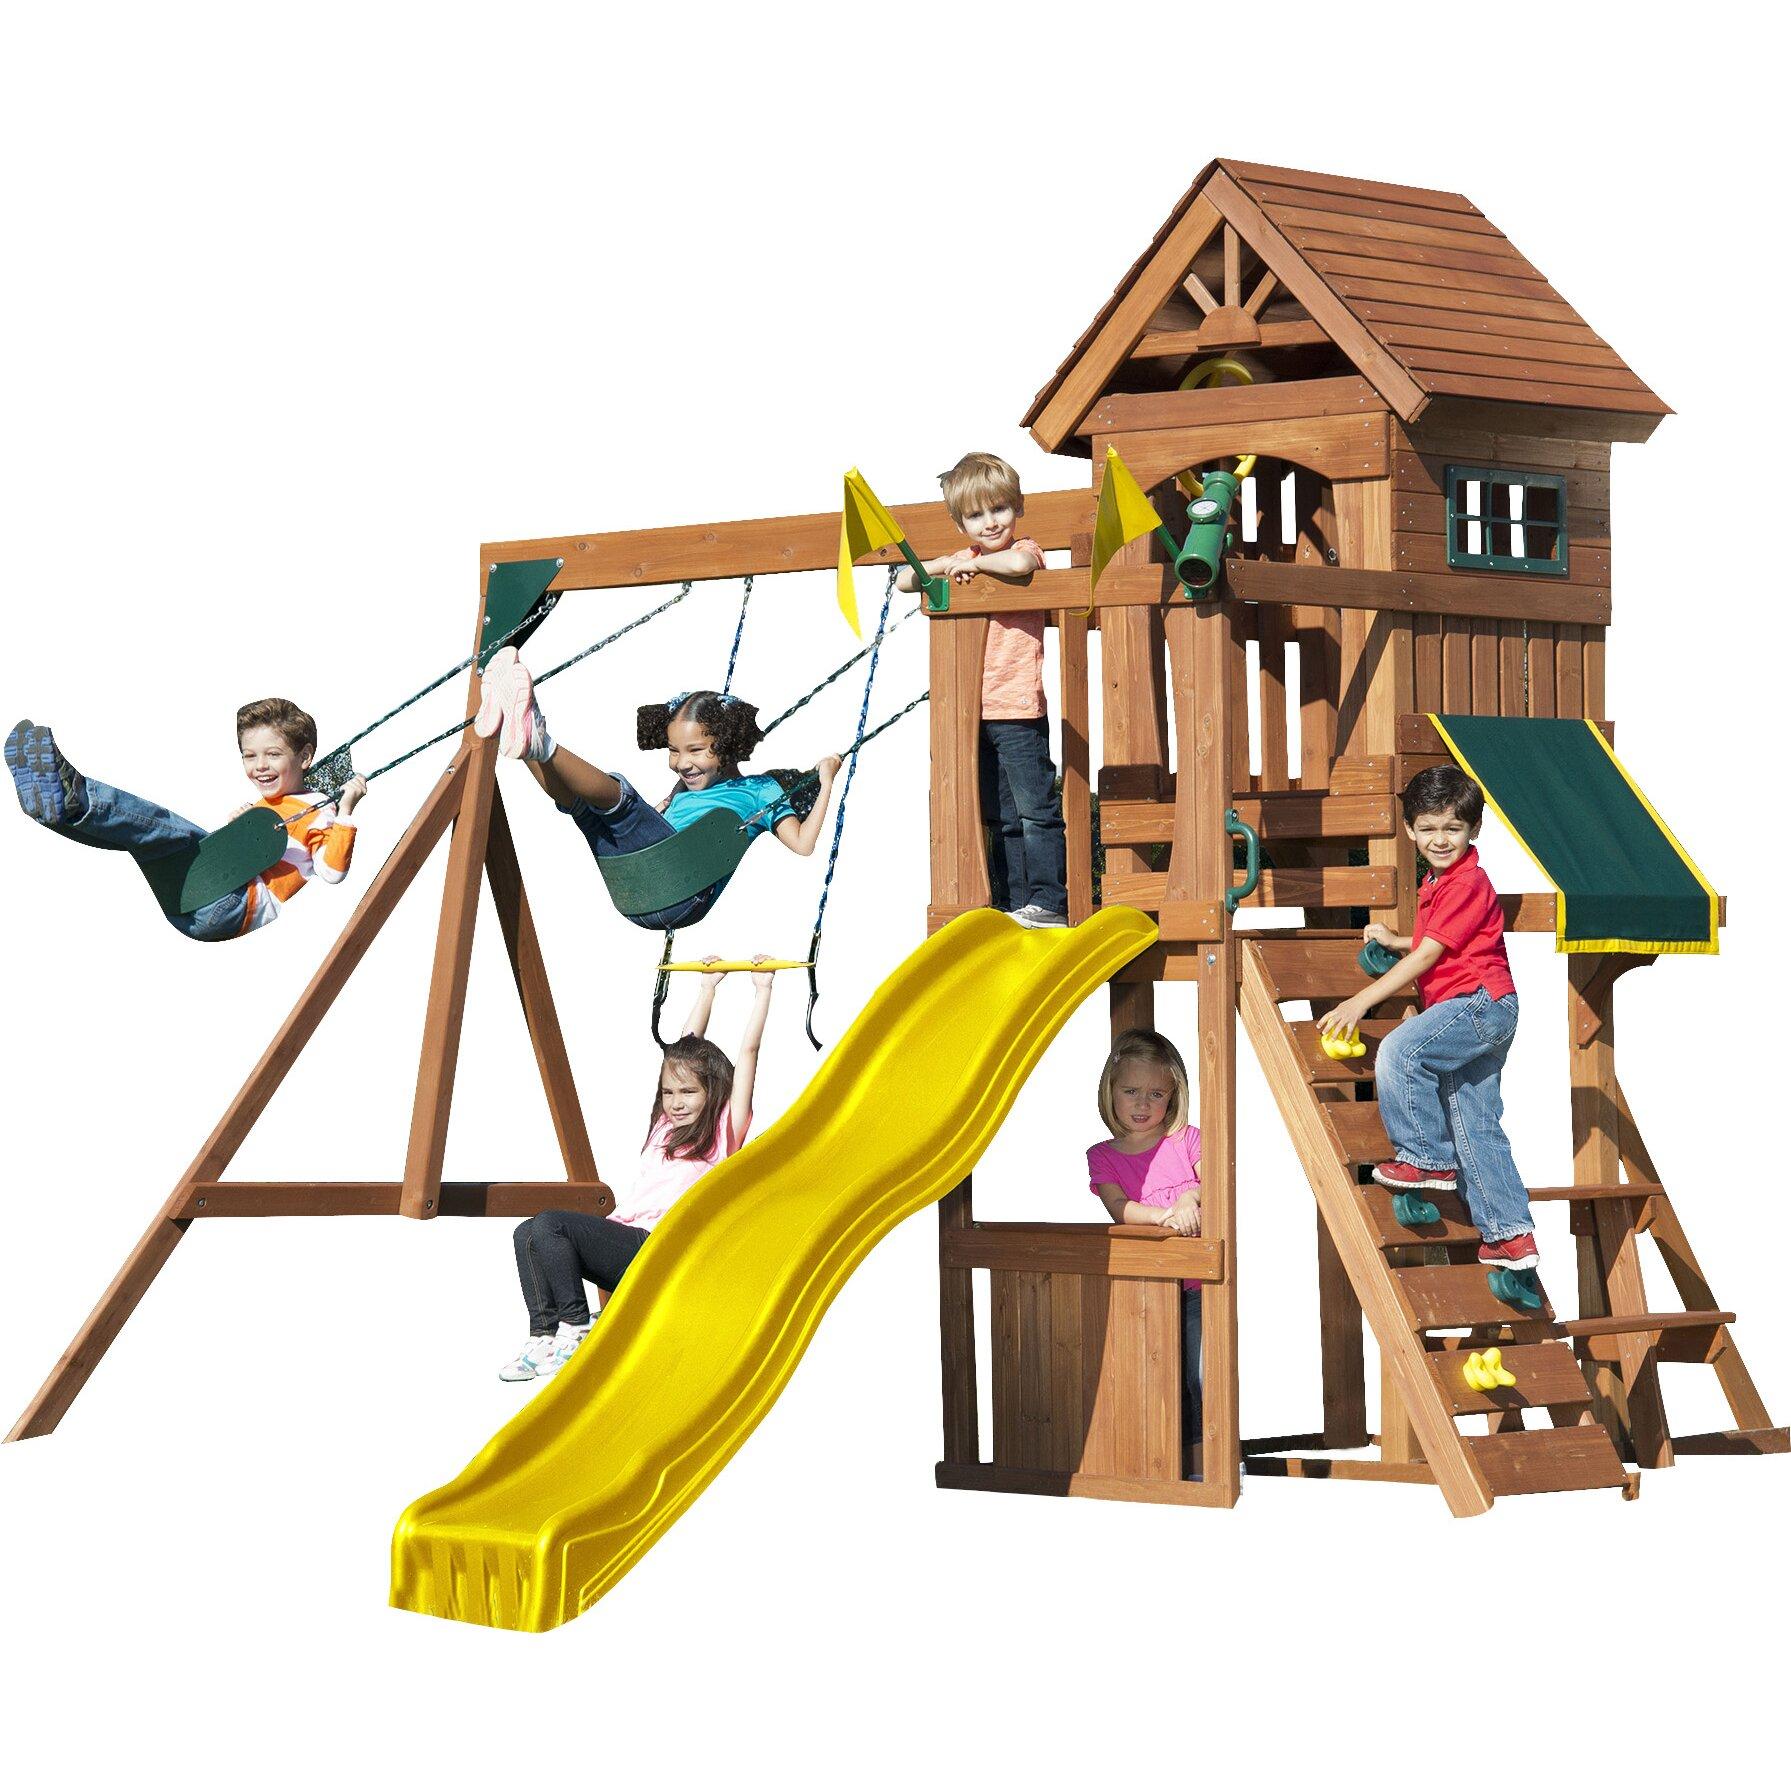 slide sets Outdoor play swing sets waterslides nerf & blasters swimming pools  plastic slides  step2 big folding slide, pink,.